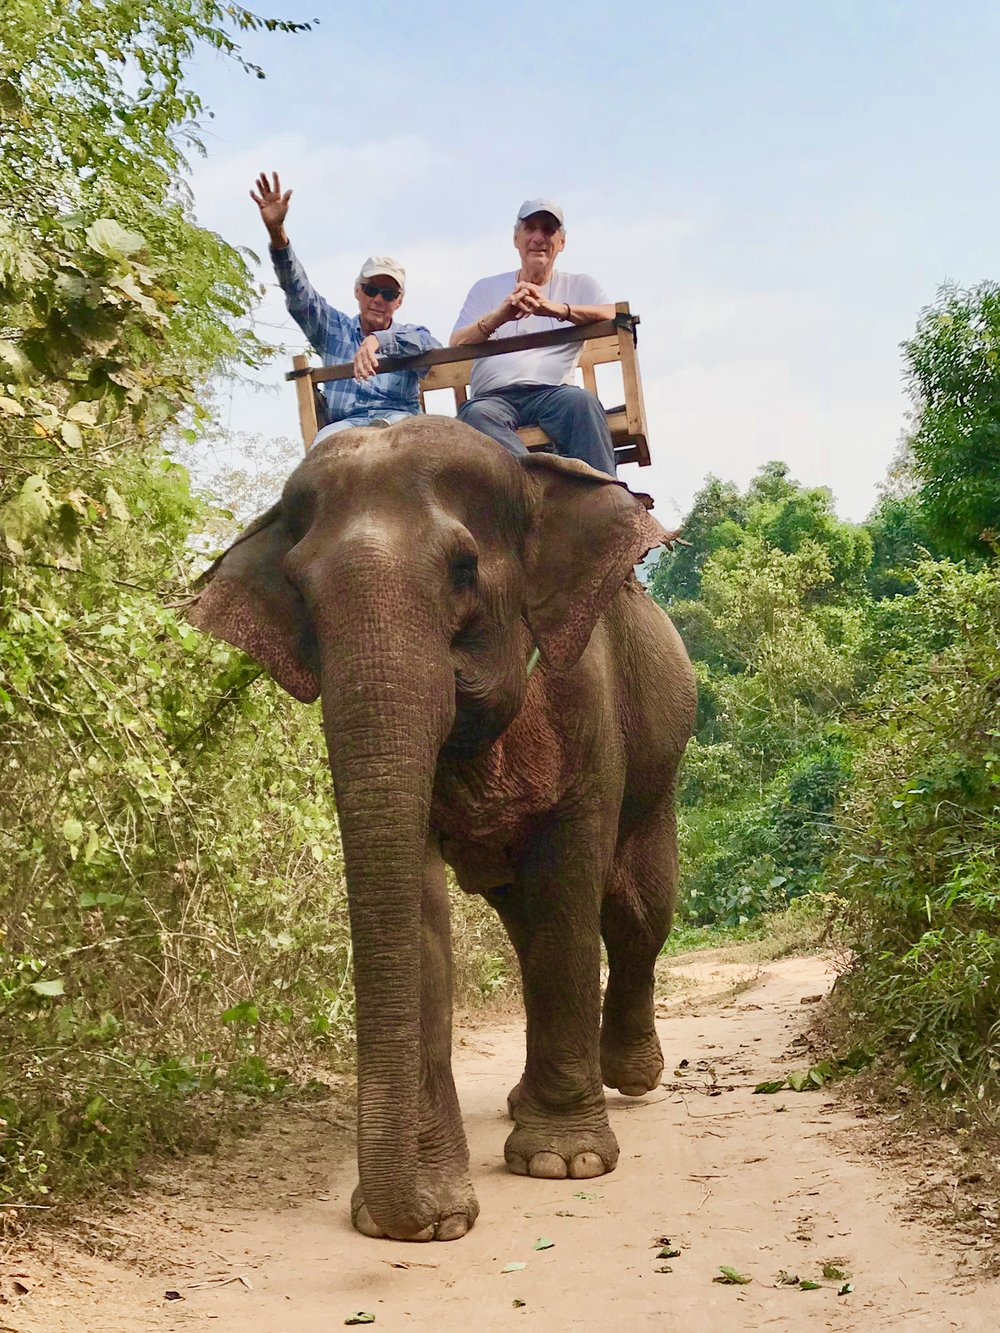 Ed waiving & Me on elephant.jpg*.jpg